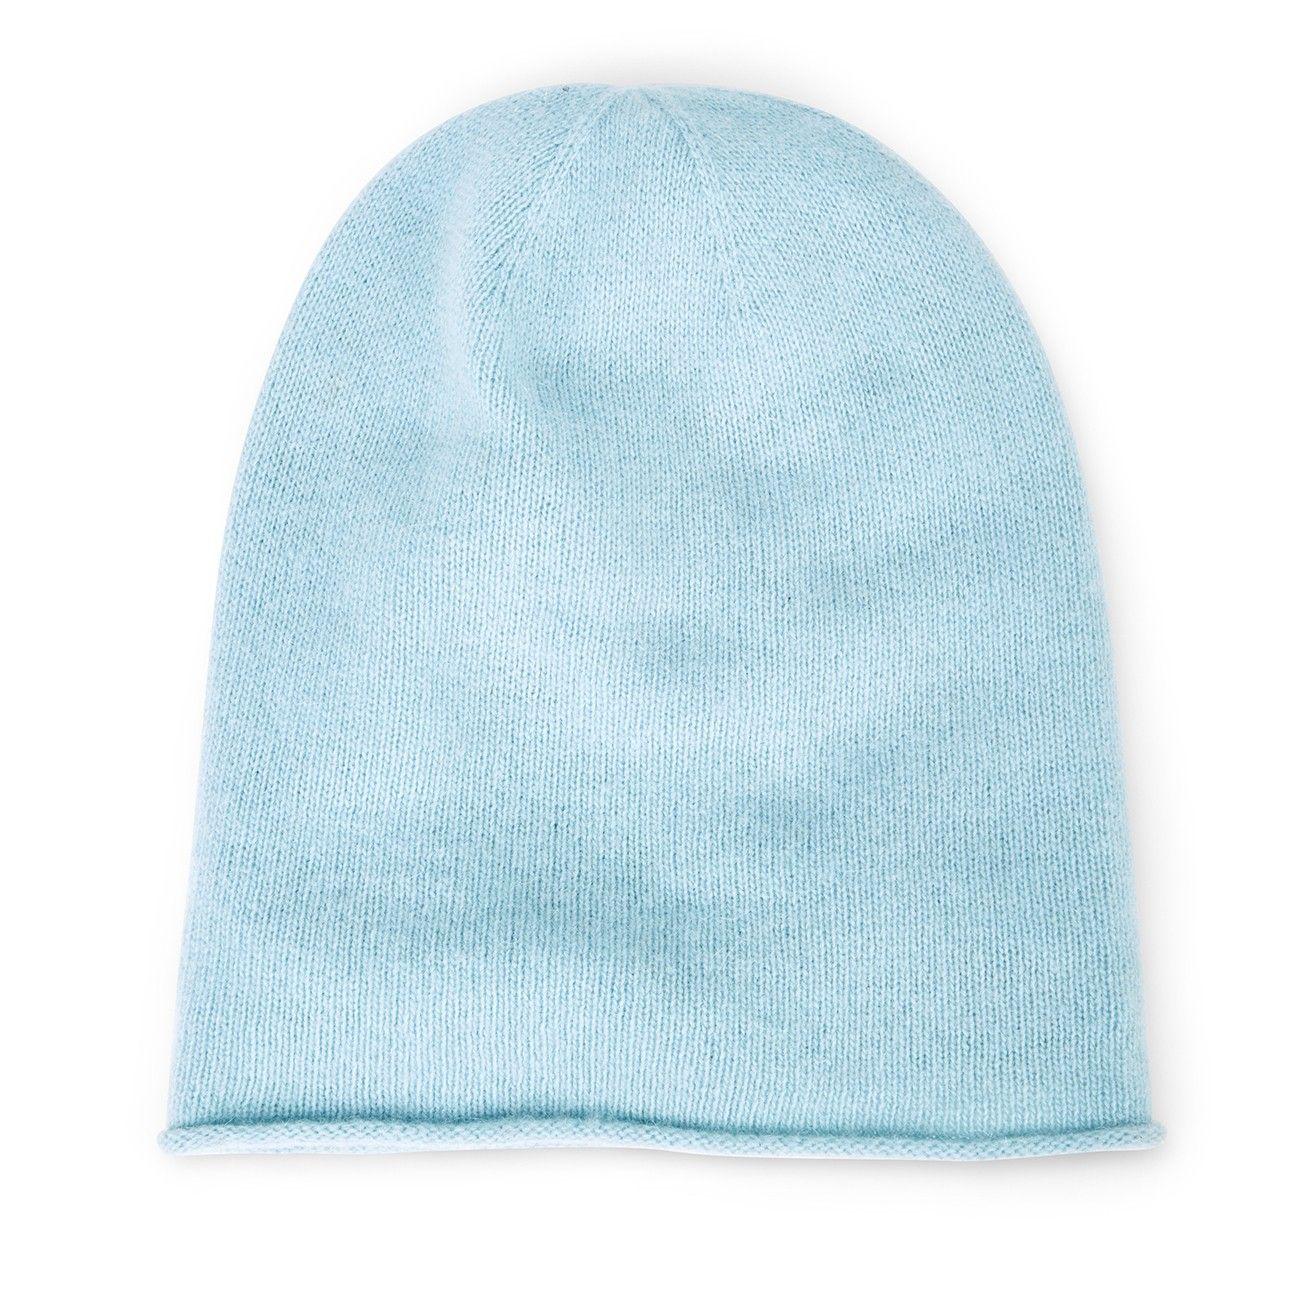 4642503518d Lightweight Wool Beanie - Powder Blue-one size